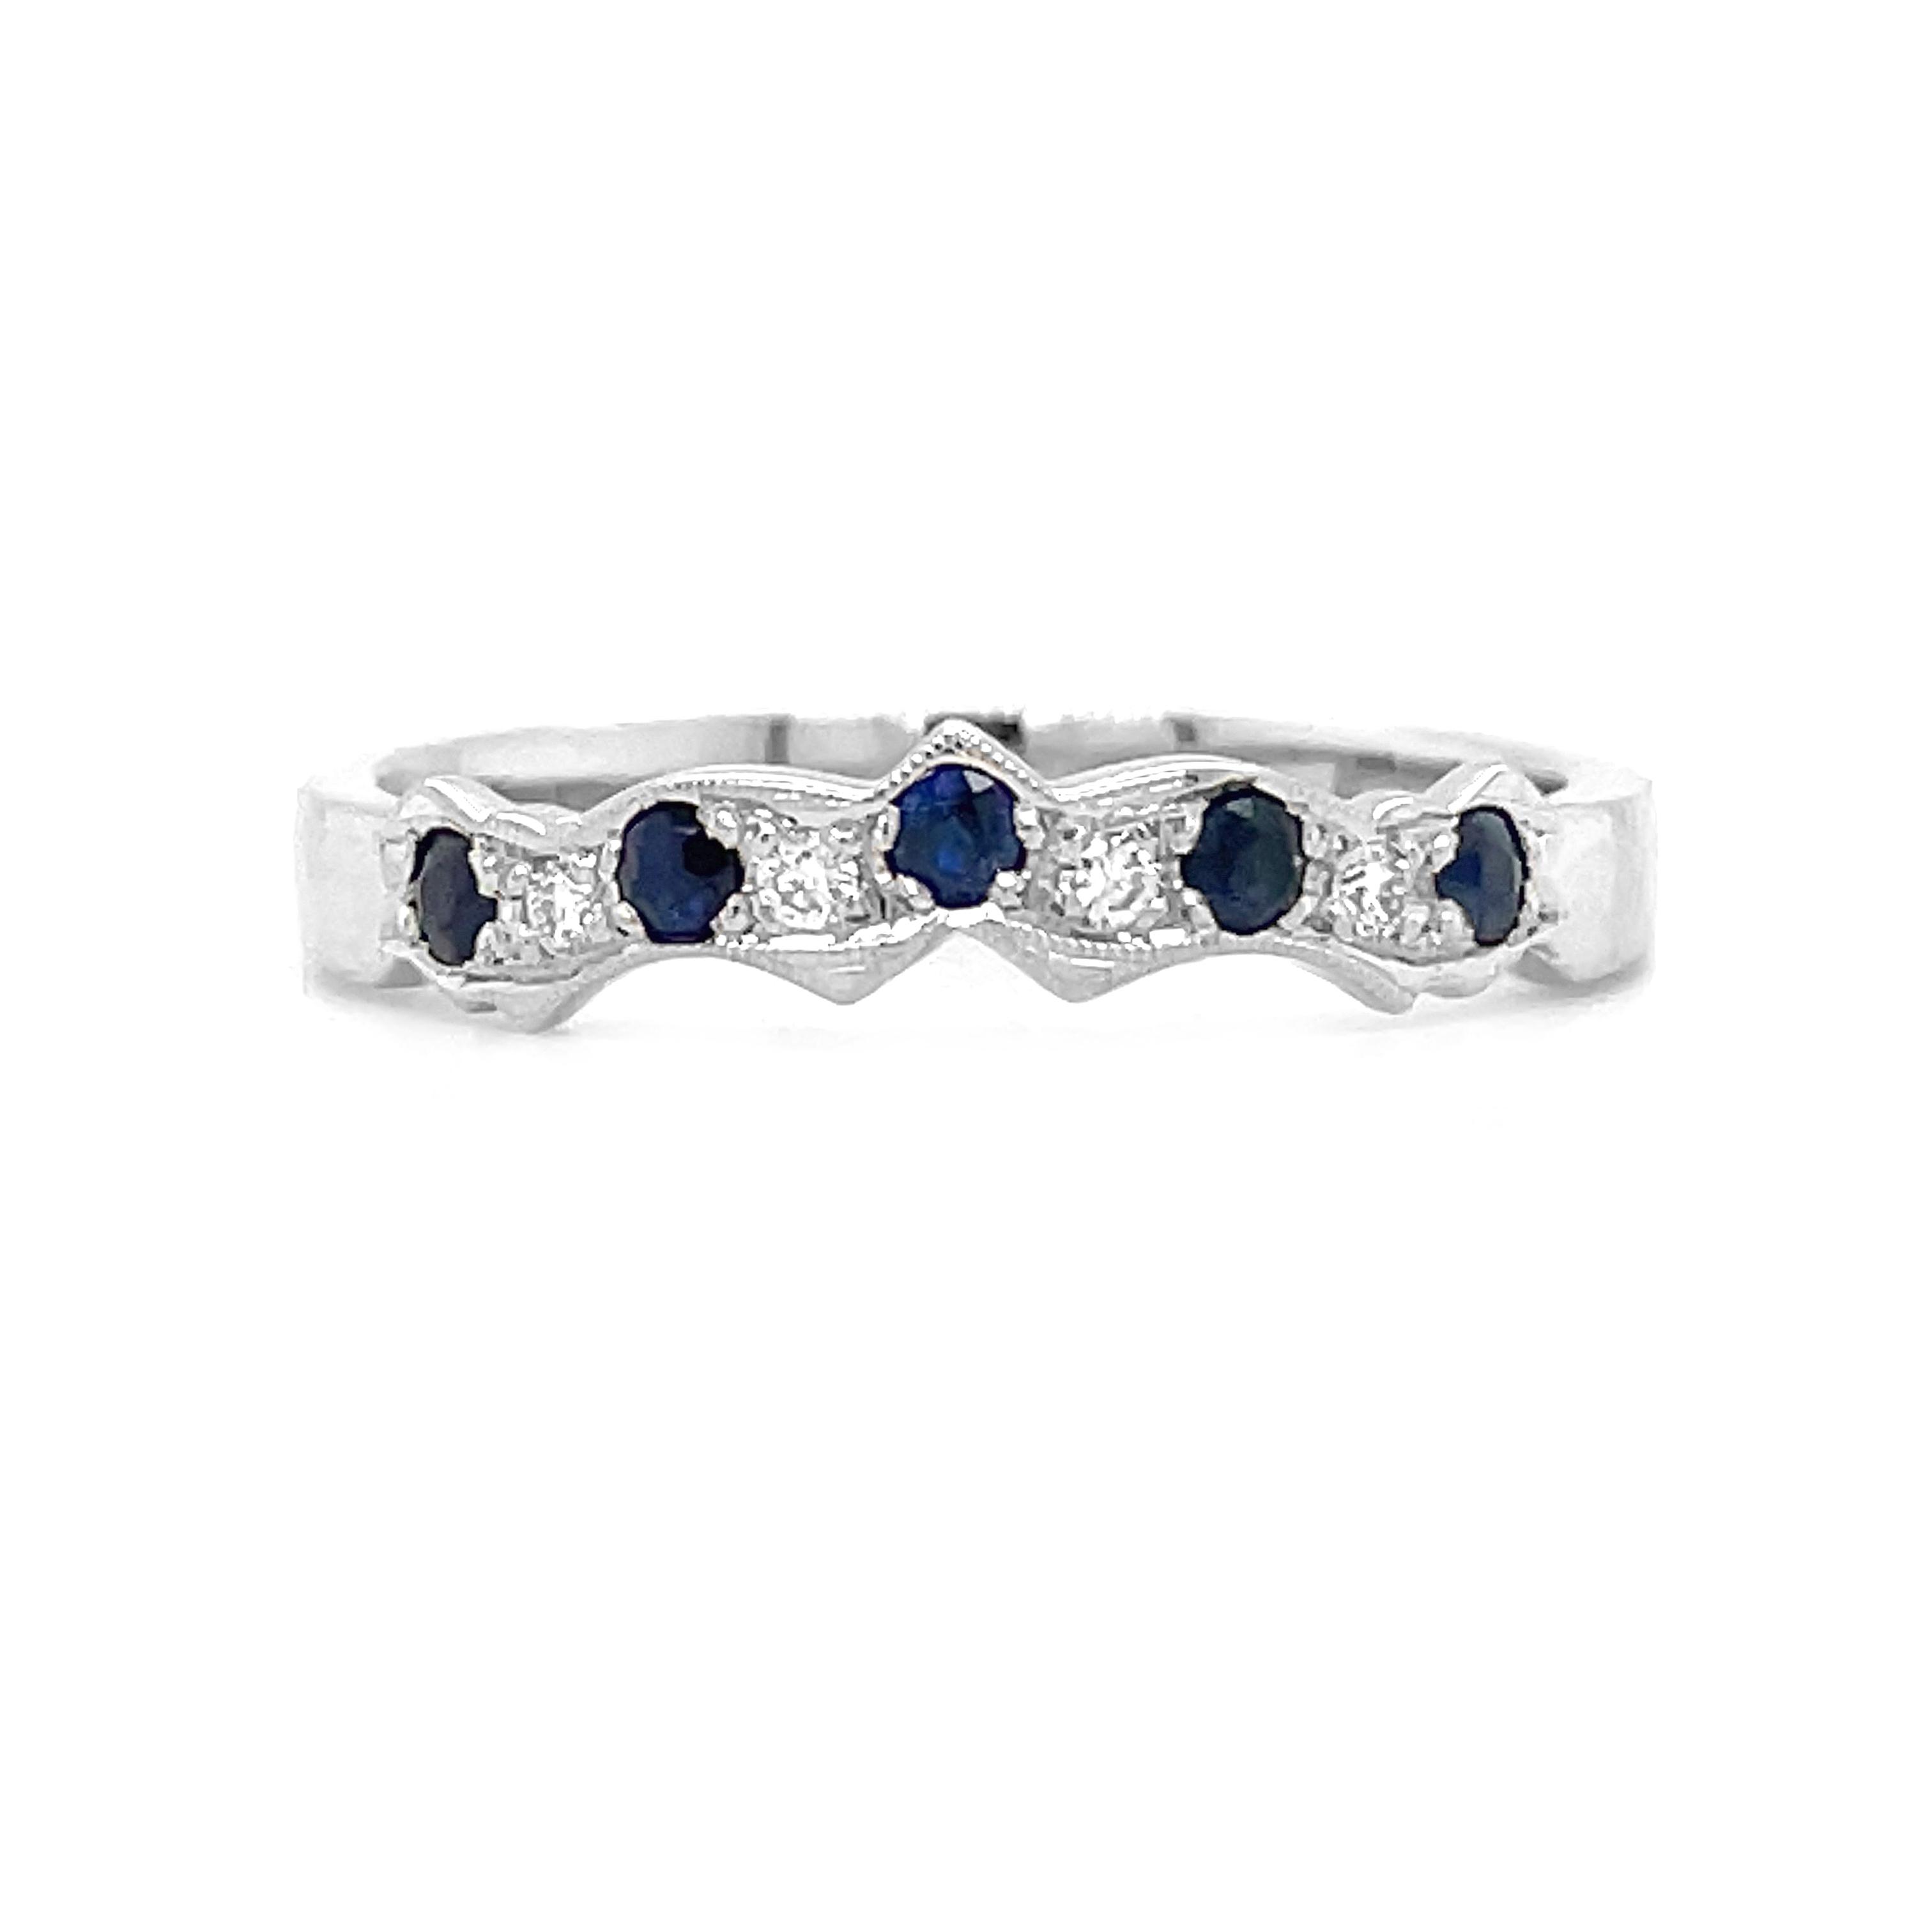 Sapphire & Diamond Claddagh Wedding Ring